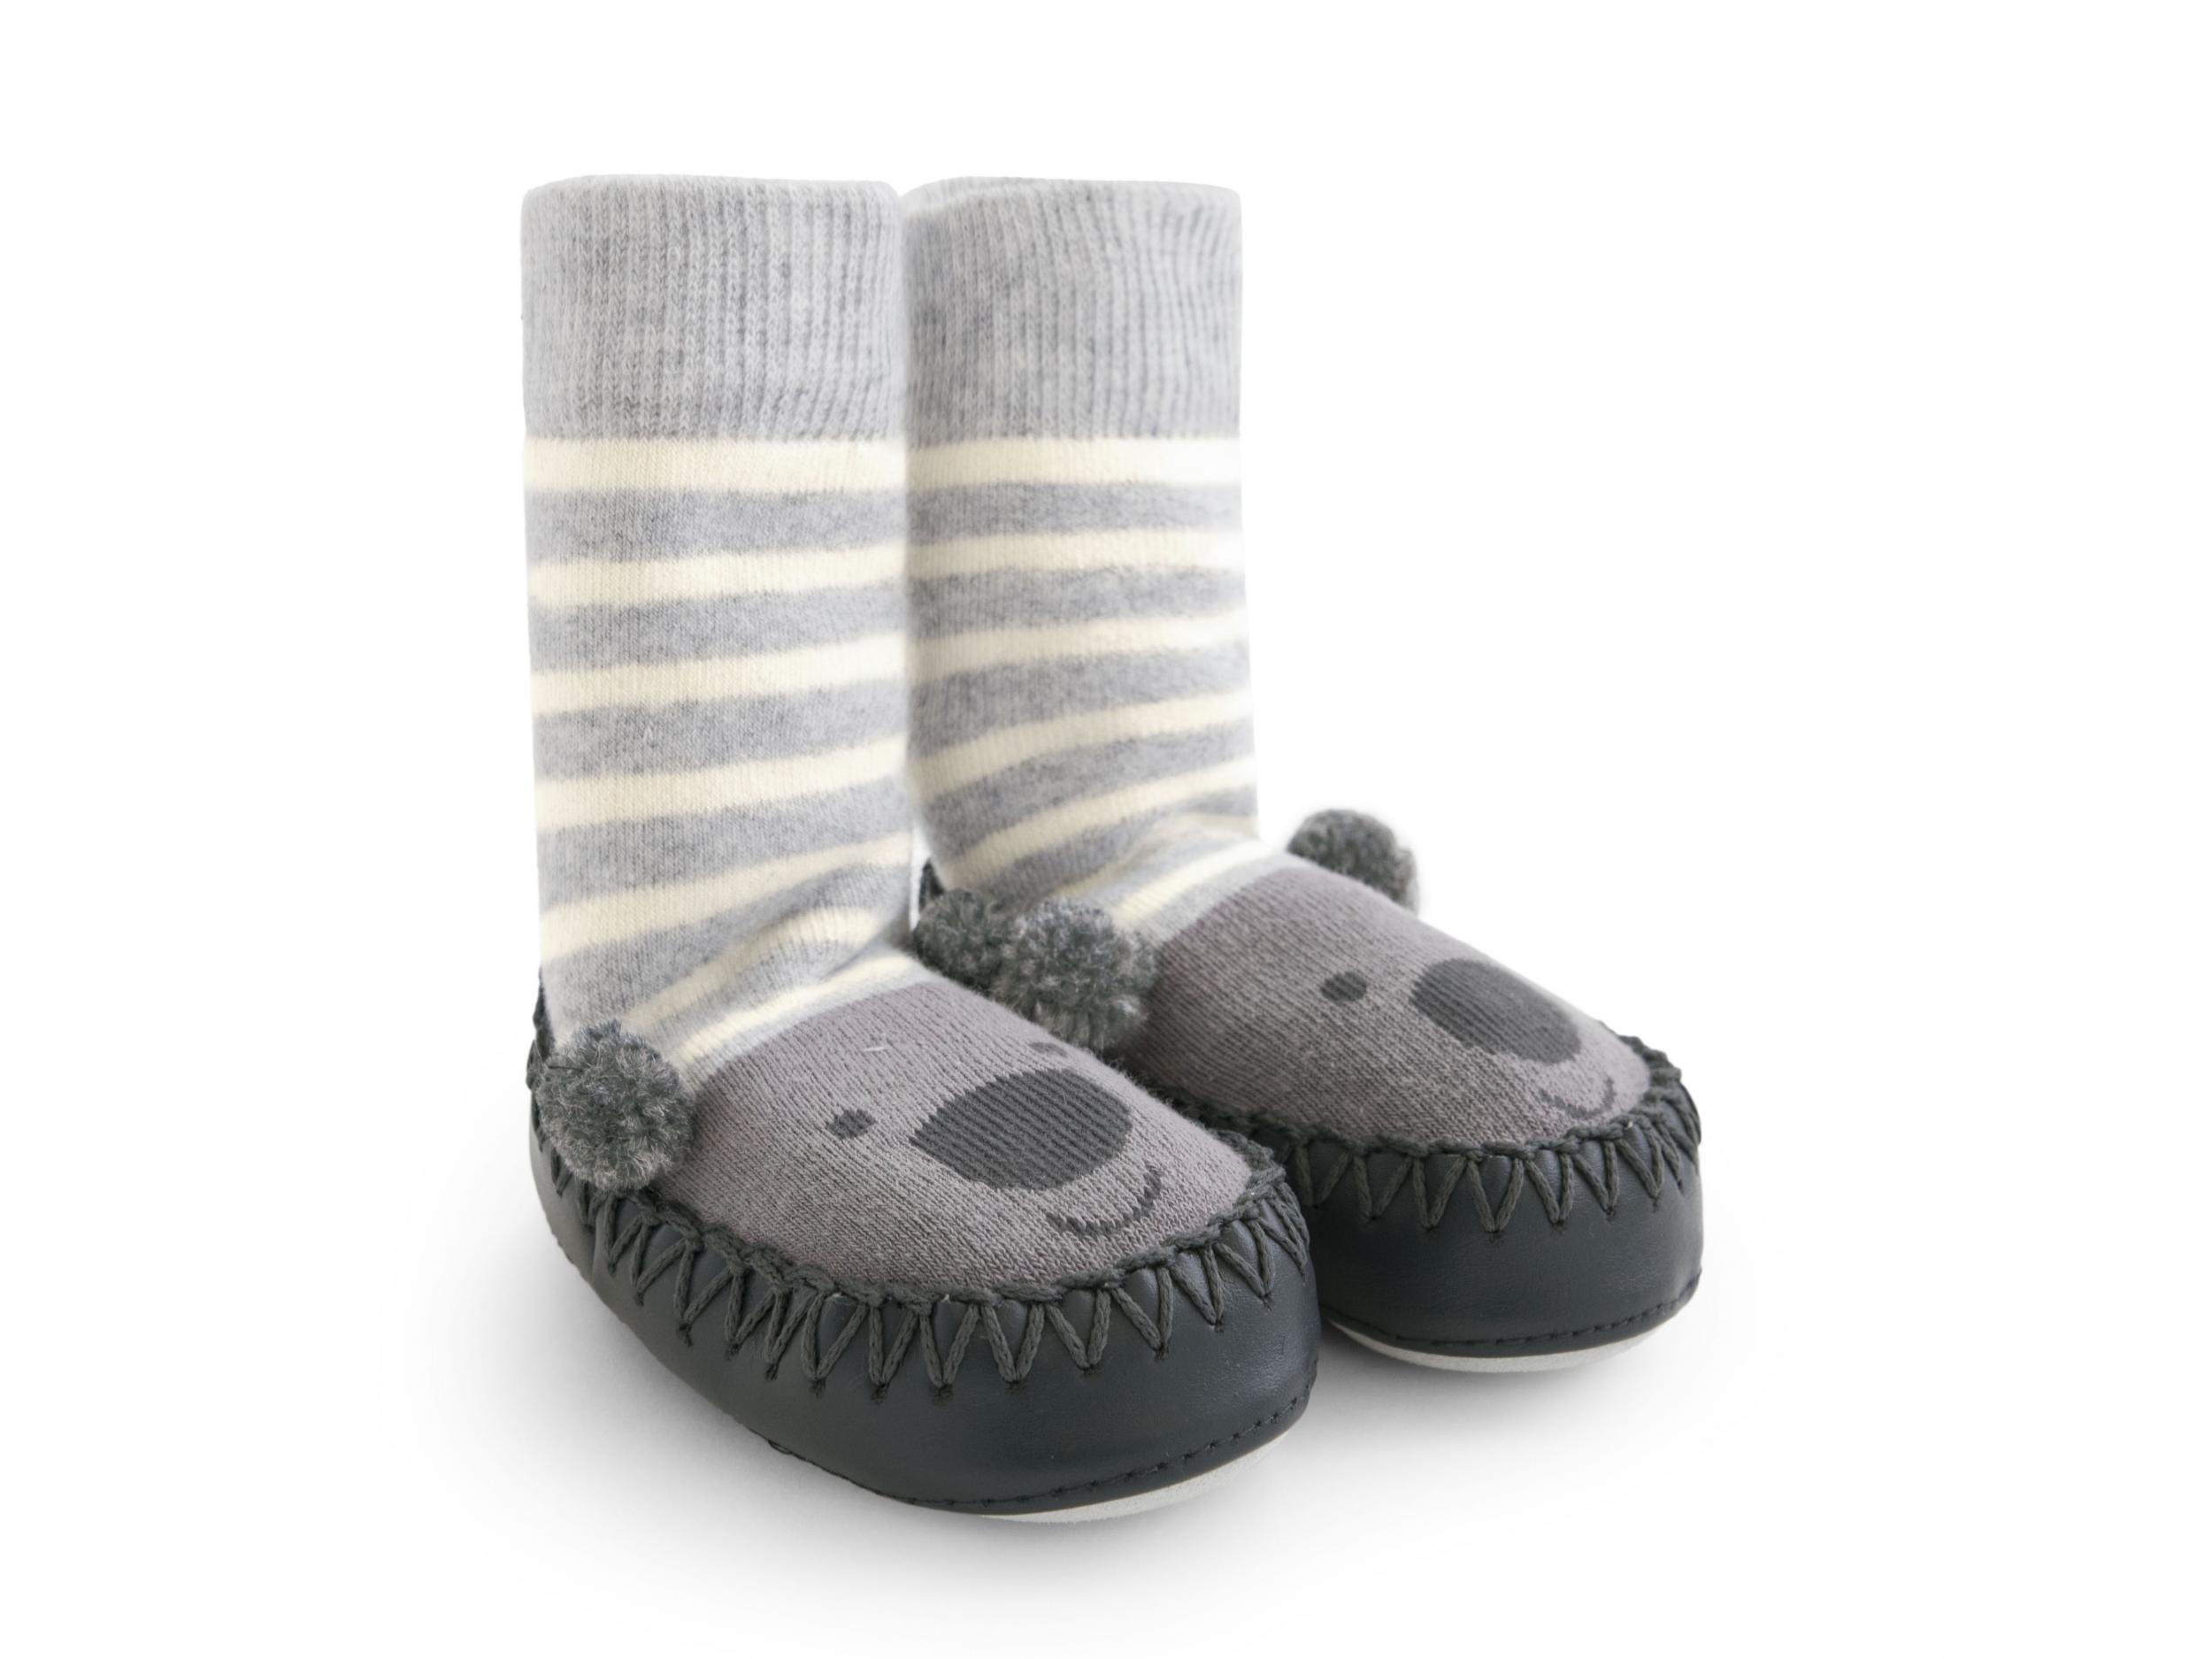 Lovely Quality 2 Different sizes Kids 2 pack Slipper socks Machine washable